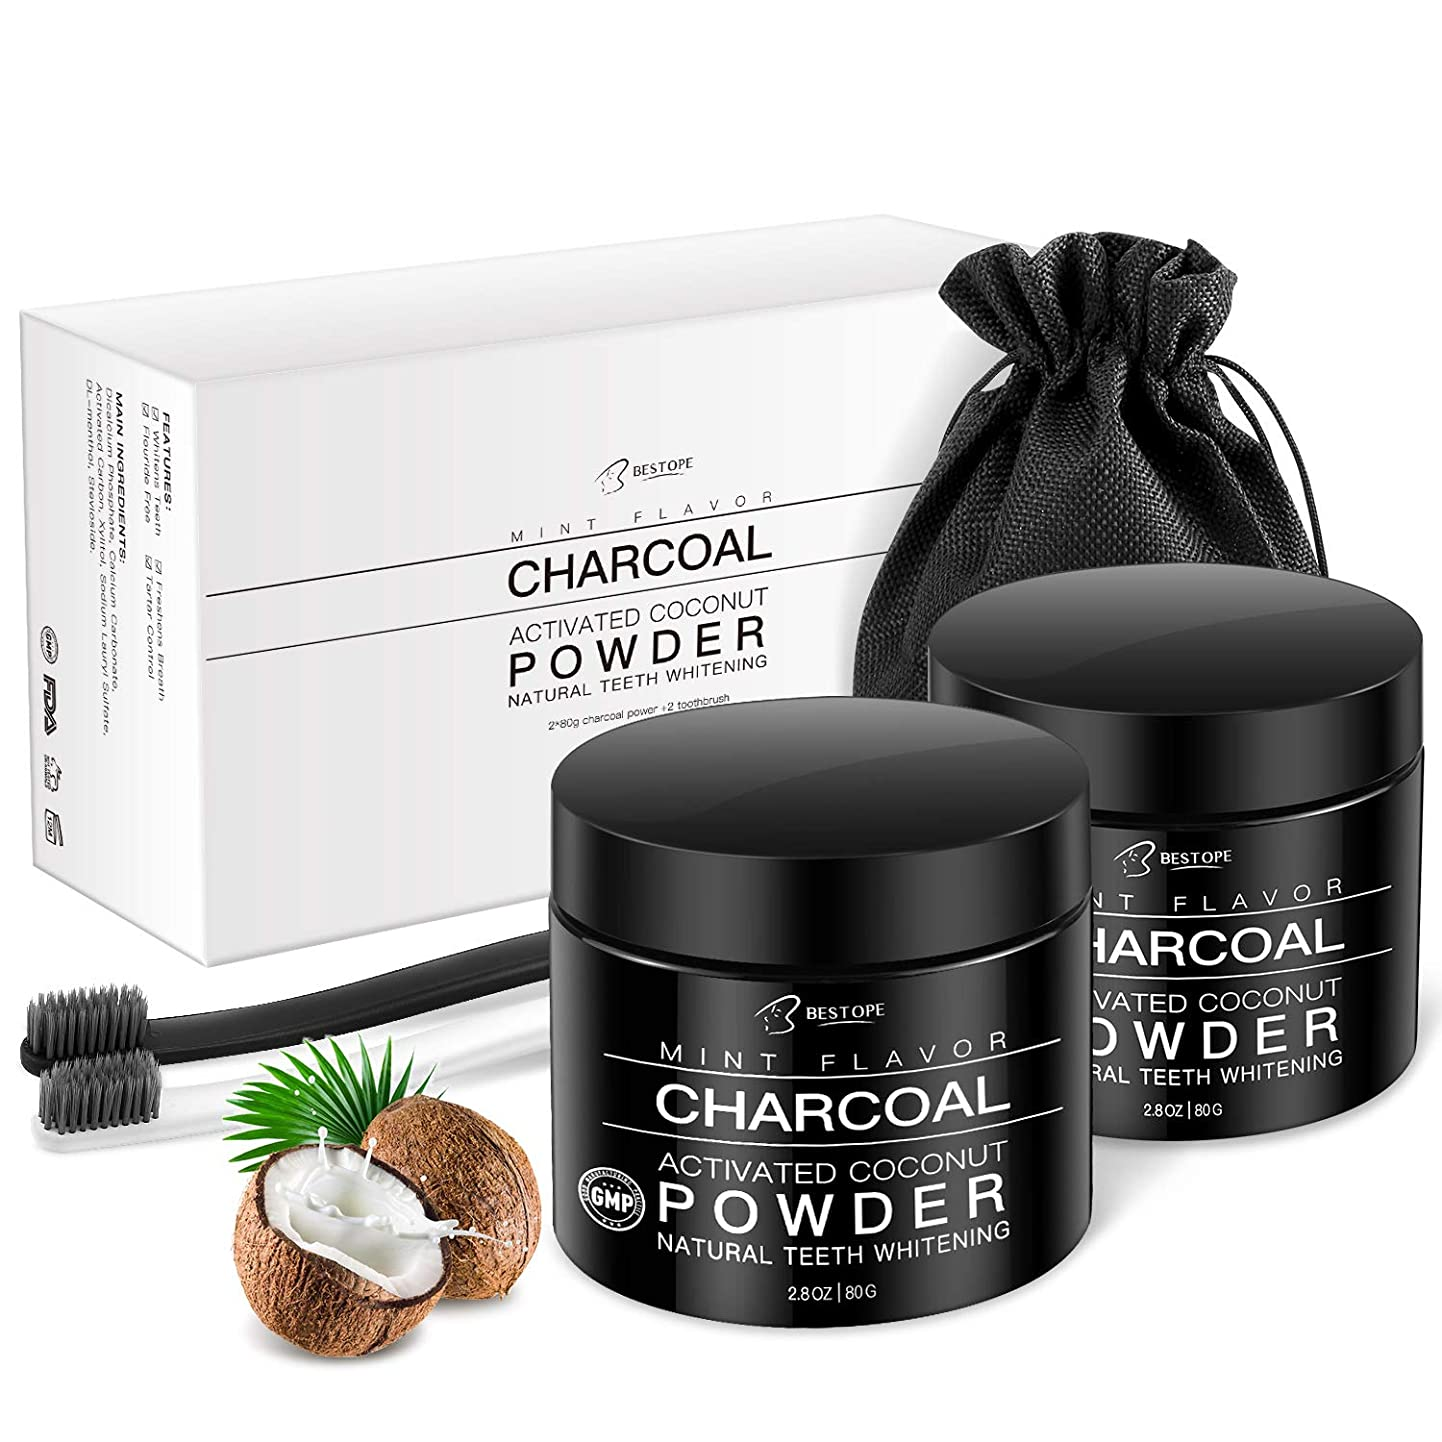 BESTOPE Teeth Whitening Charcoal Powder[2 Pack], Natural Activated Charcoal Teeth Whitener Powder with 2 Brush Oral Care Set (2.8 oz x 2) qrmezvrnhpw3